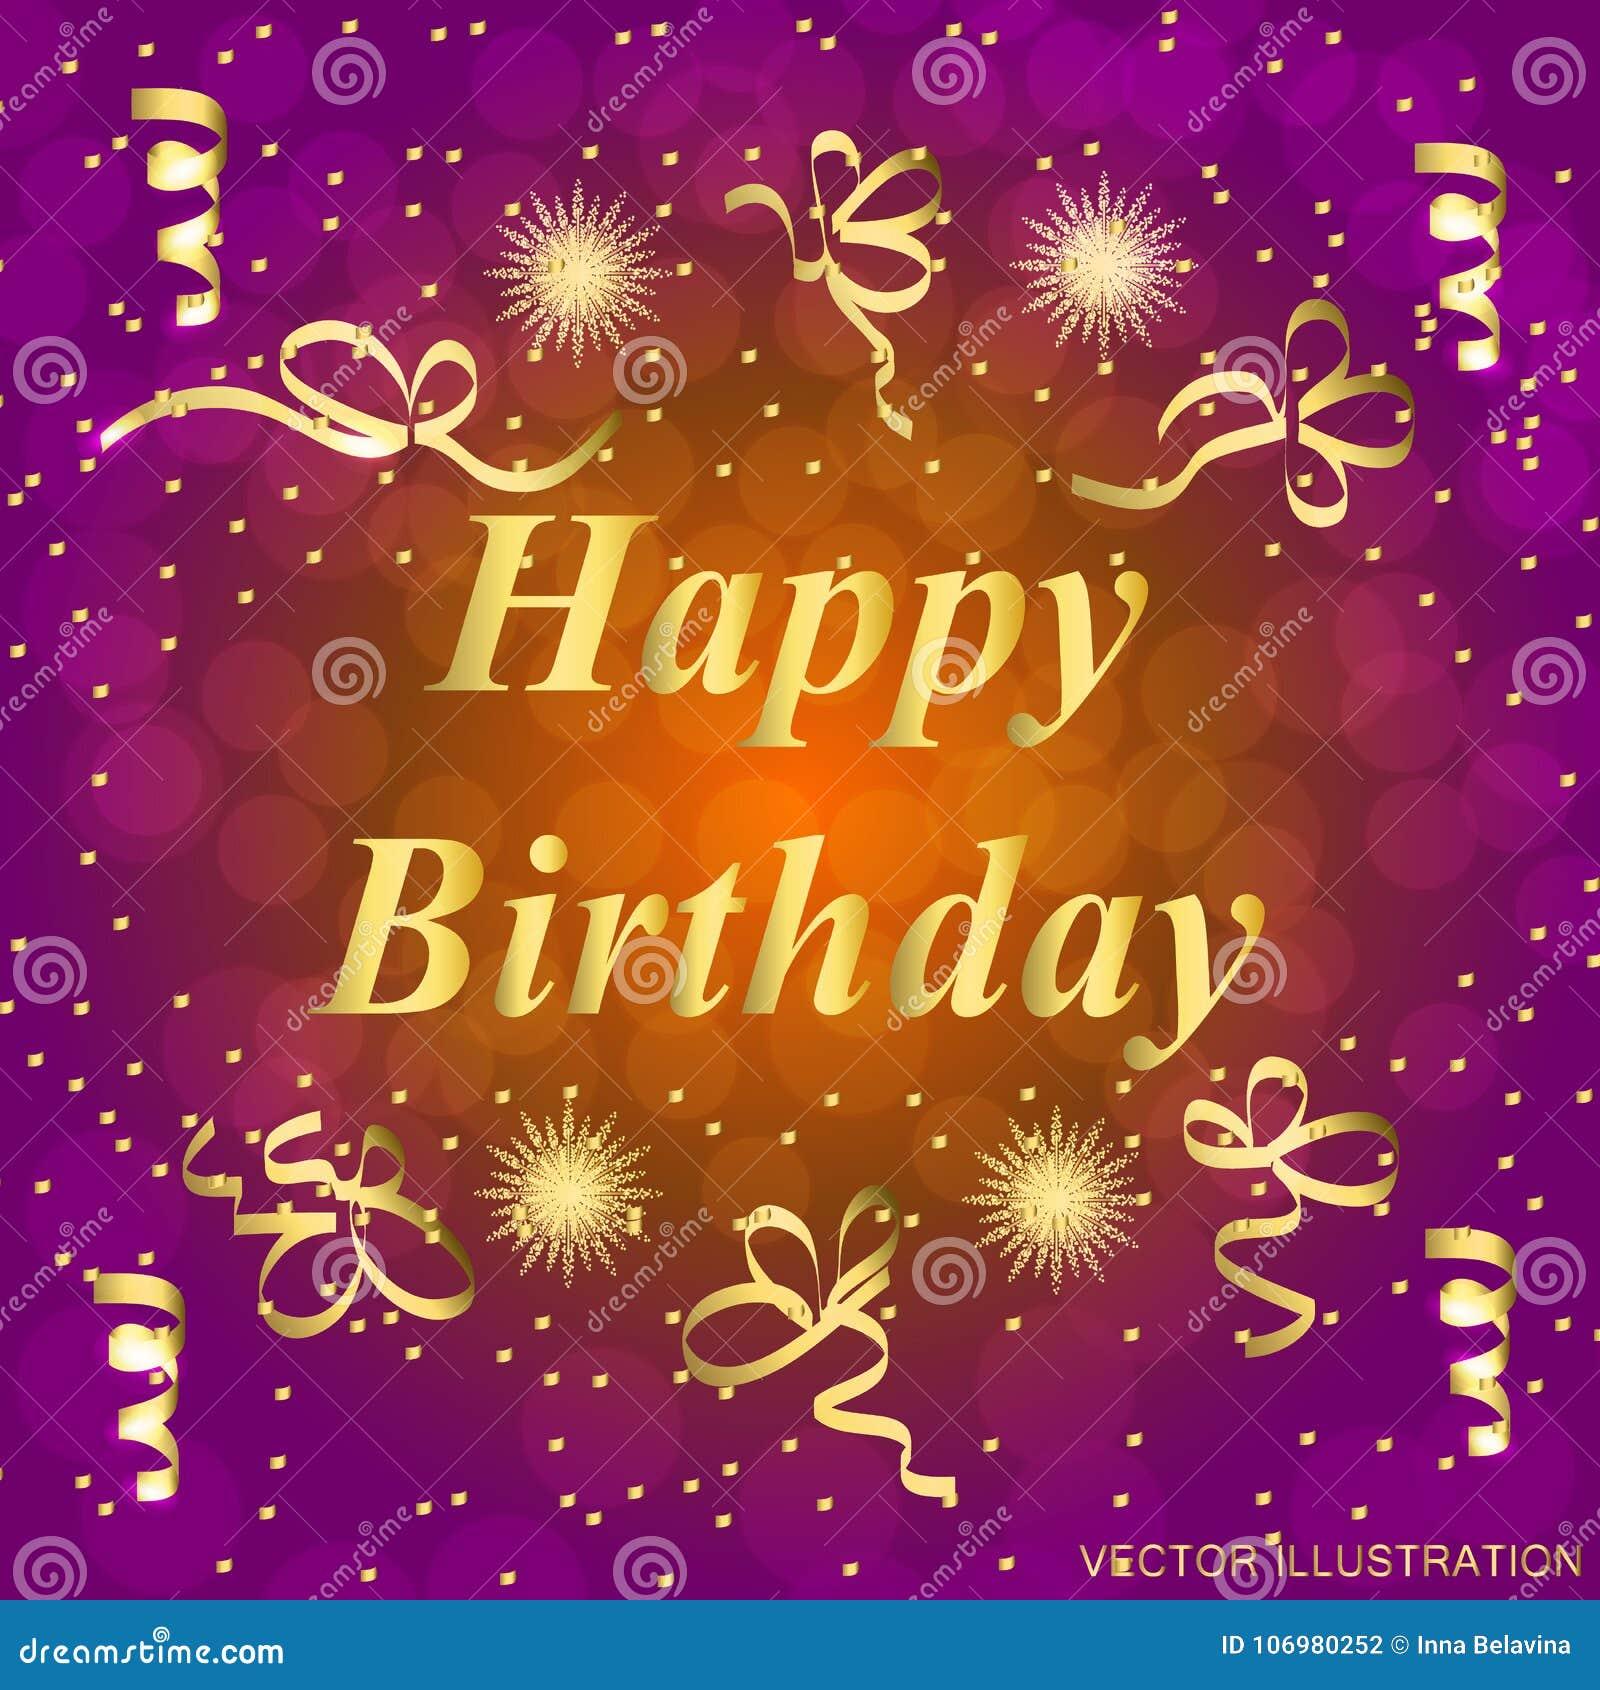 Happy Birthday Greeting Card. Brightly Colorful Illustration. Happy ...